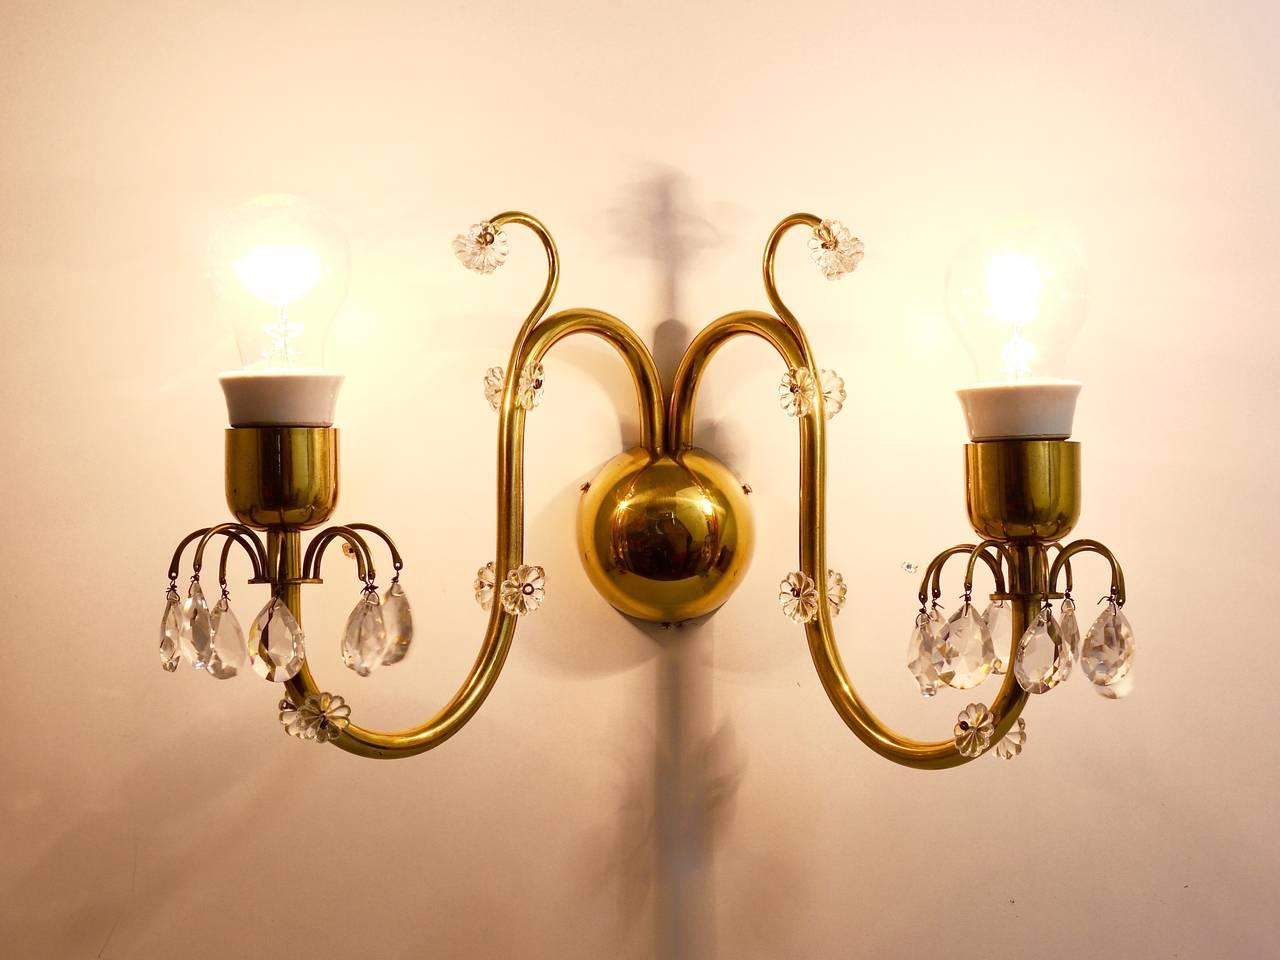 Beautiful Huge Lobmeyr Vienna Brass Crystal Sconce Wall Light, Austria, 1950s For Sale 3